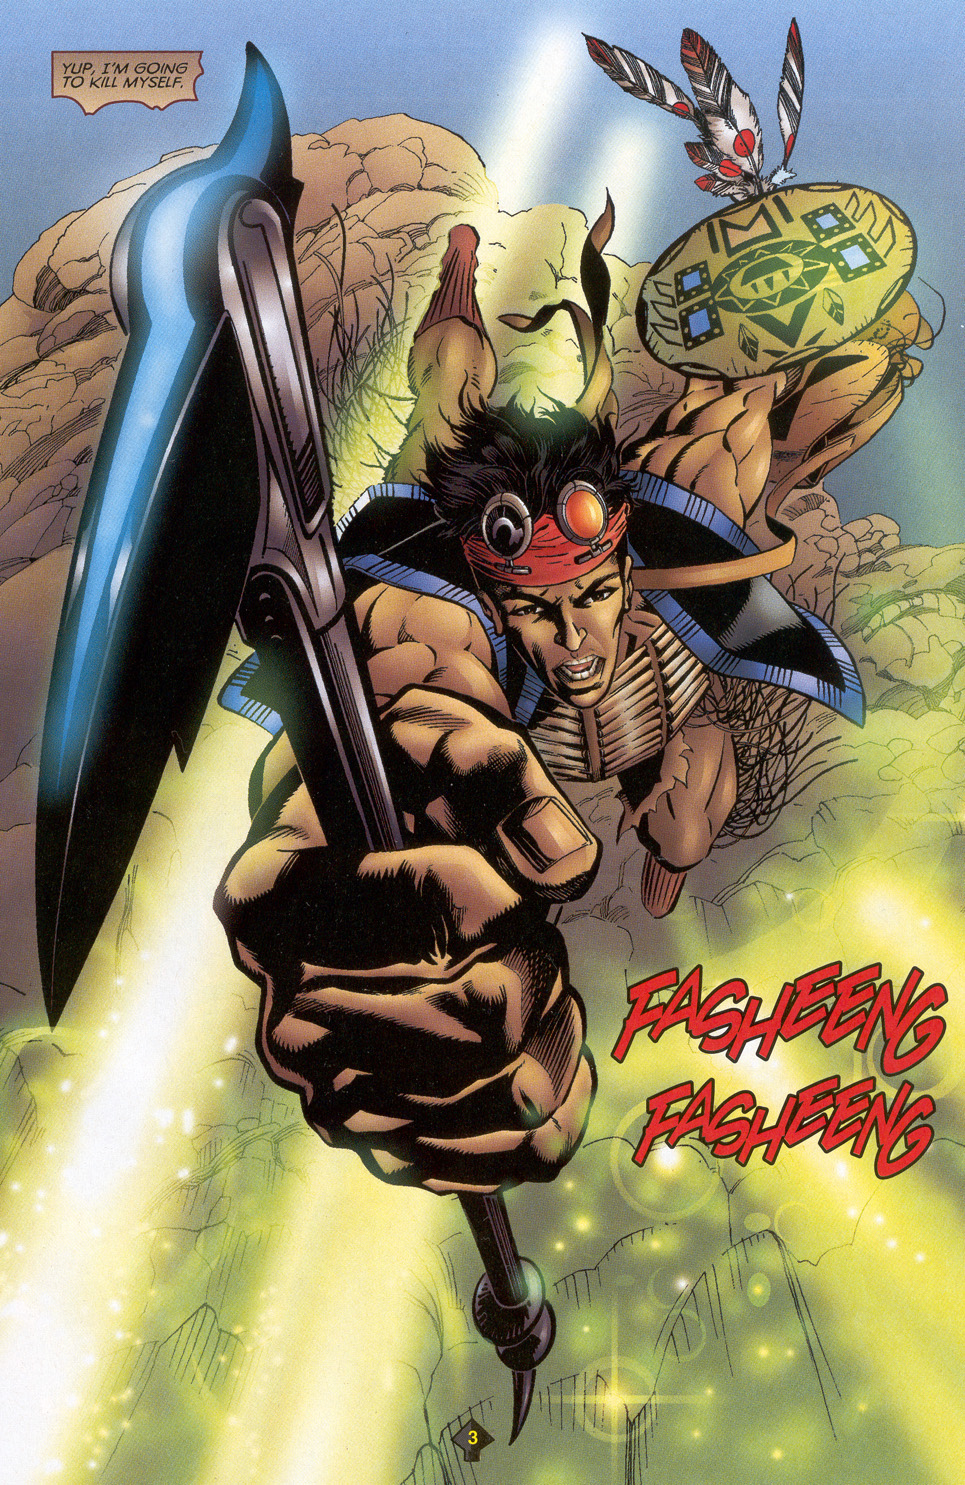 Read online Turok: Redpath comic -  Issue # Full - 4